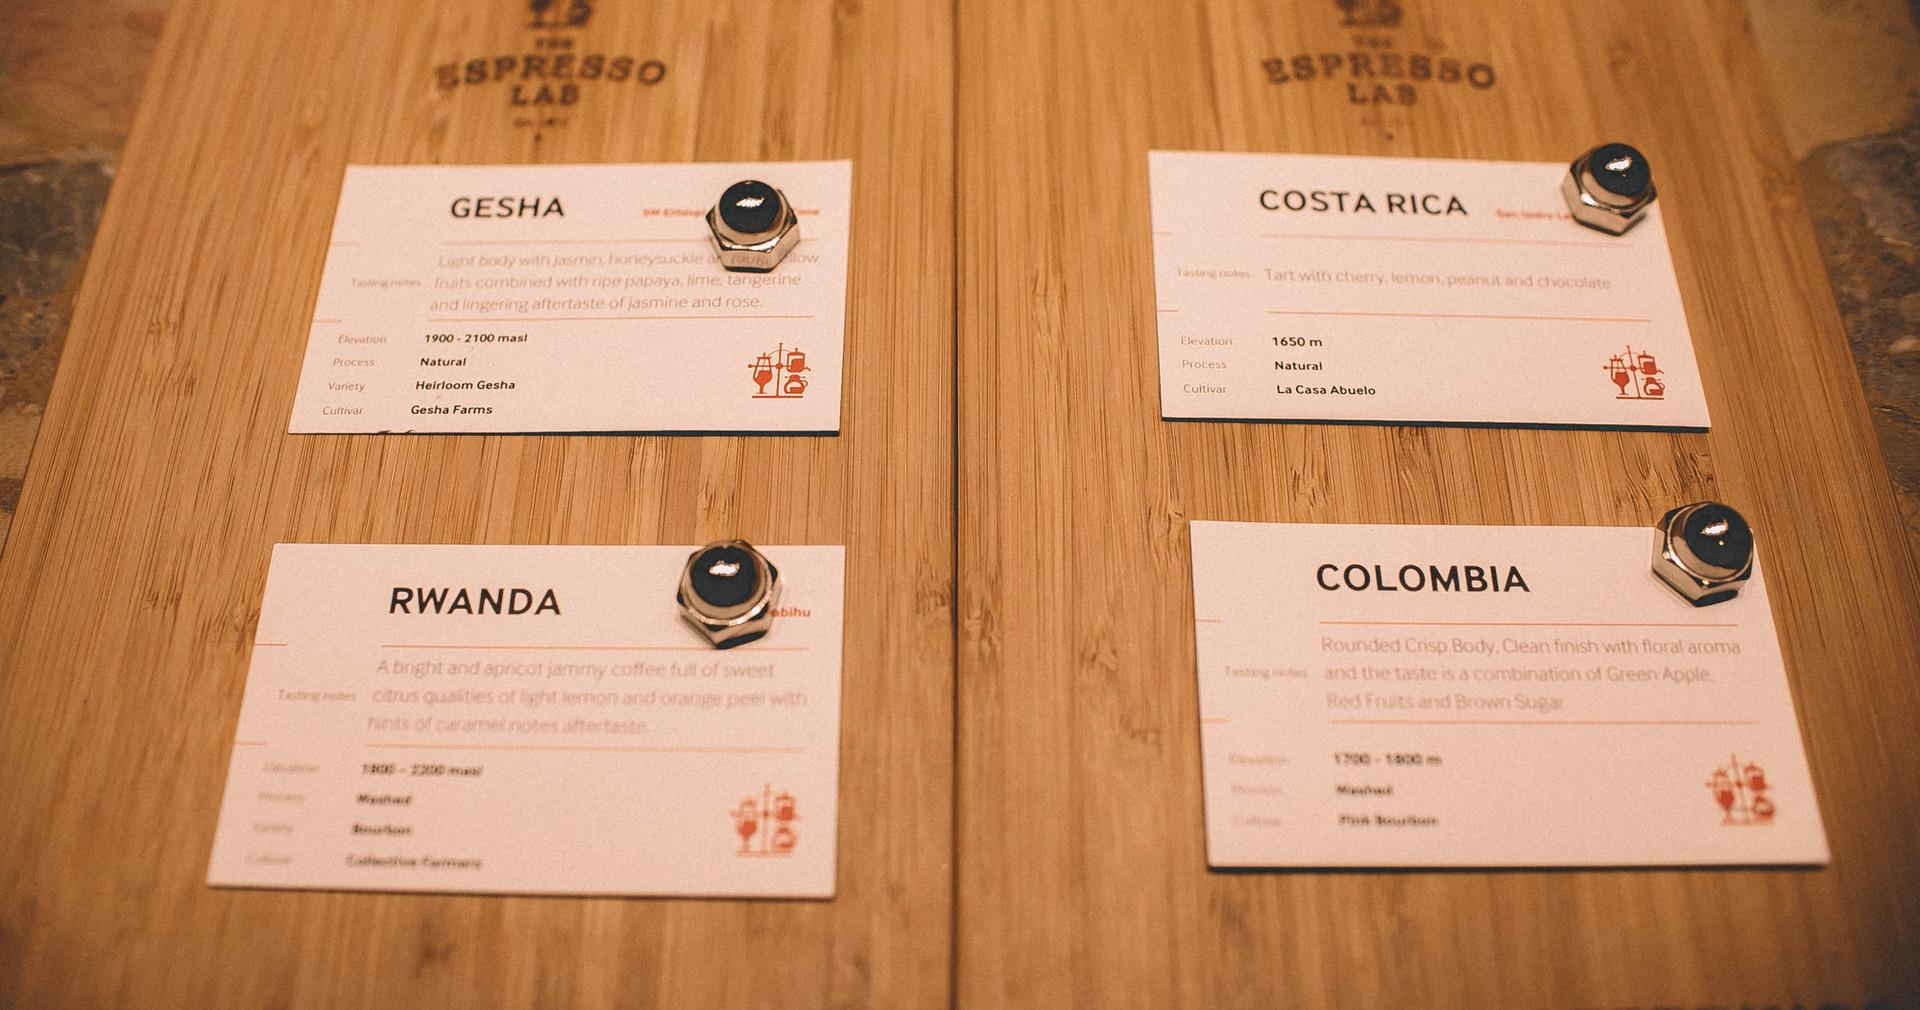 06 TLL Coffee Card and Board 2.jpg